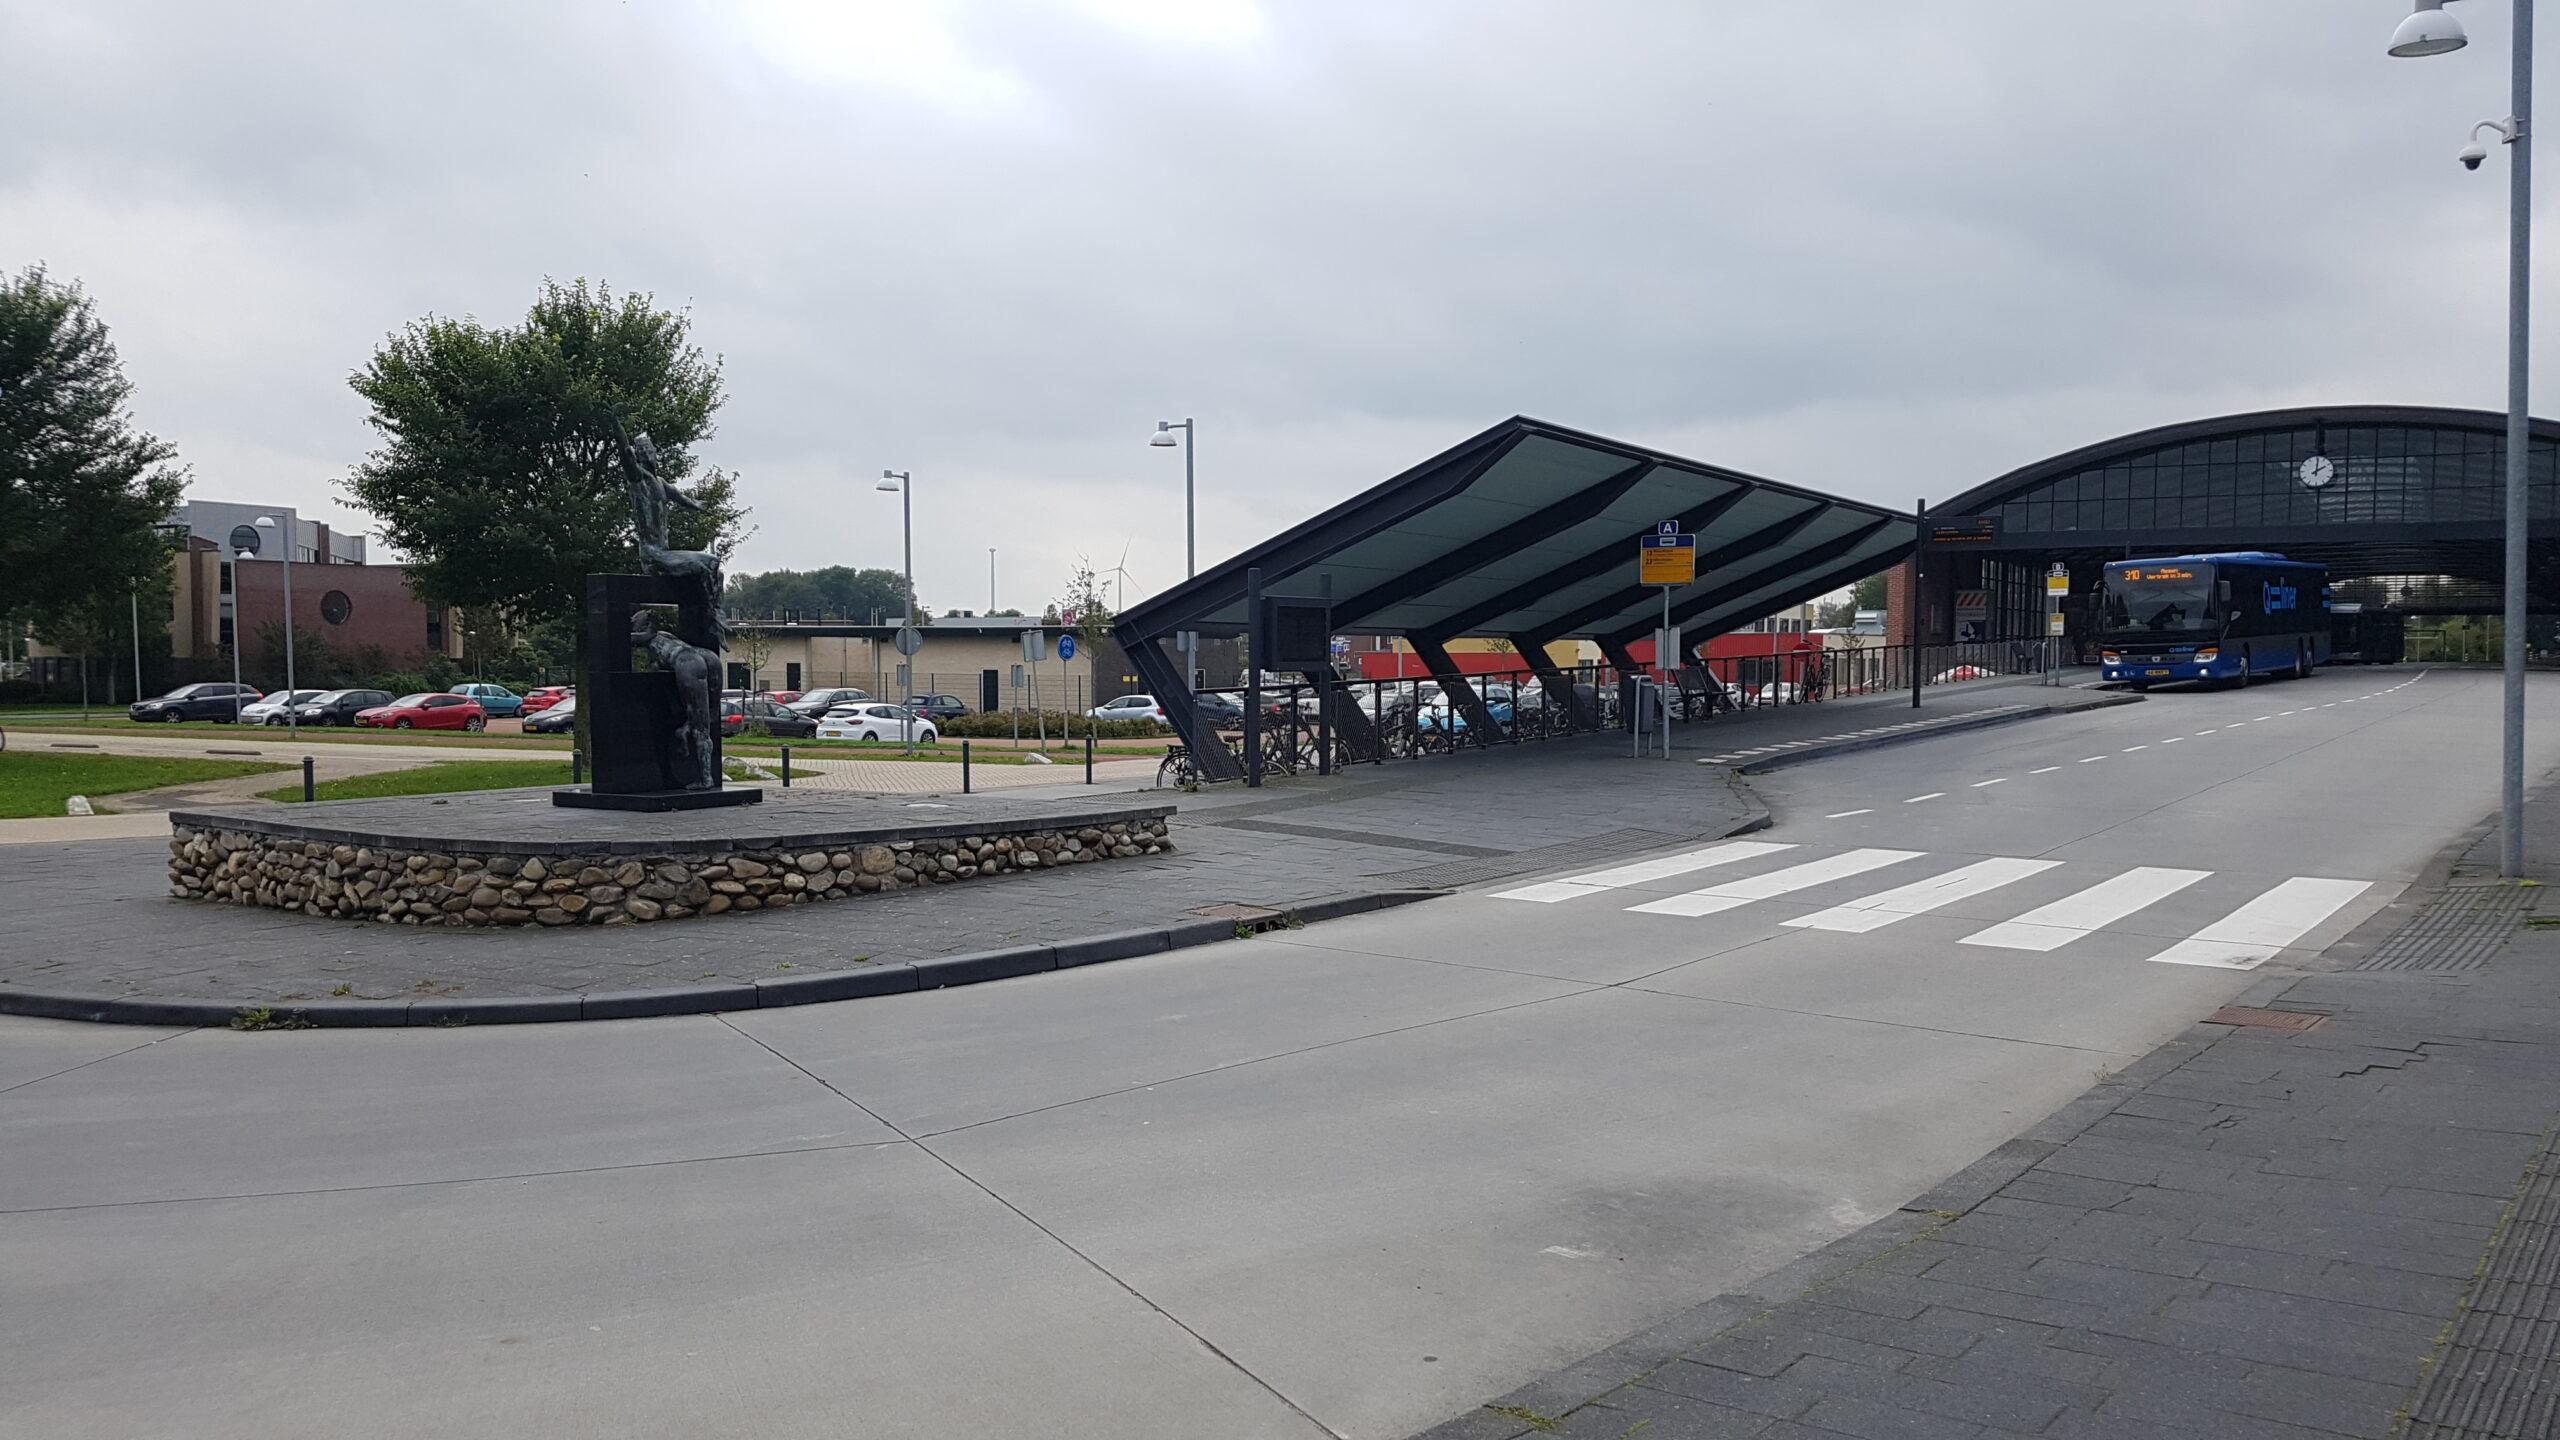 20200930_Busstation1